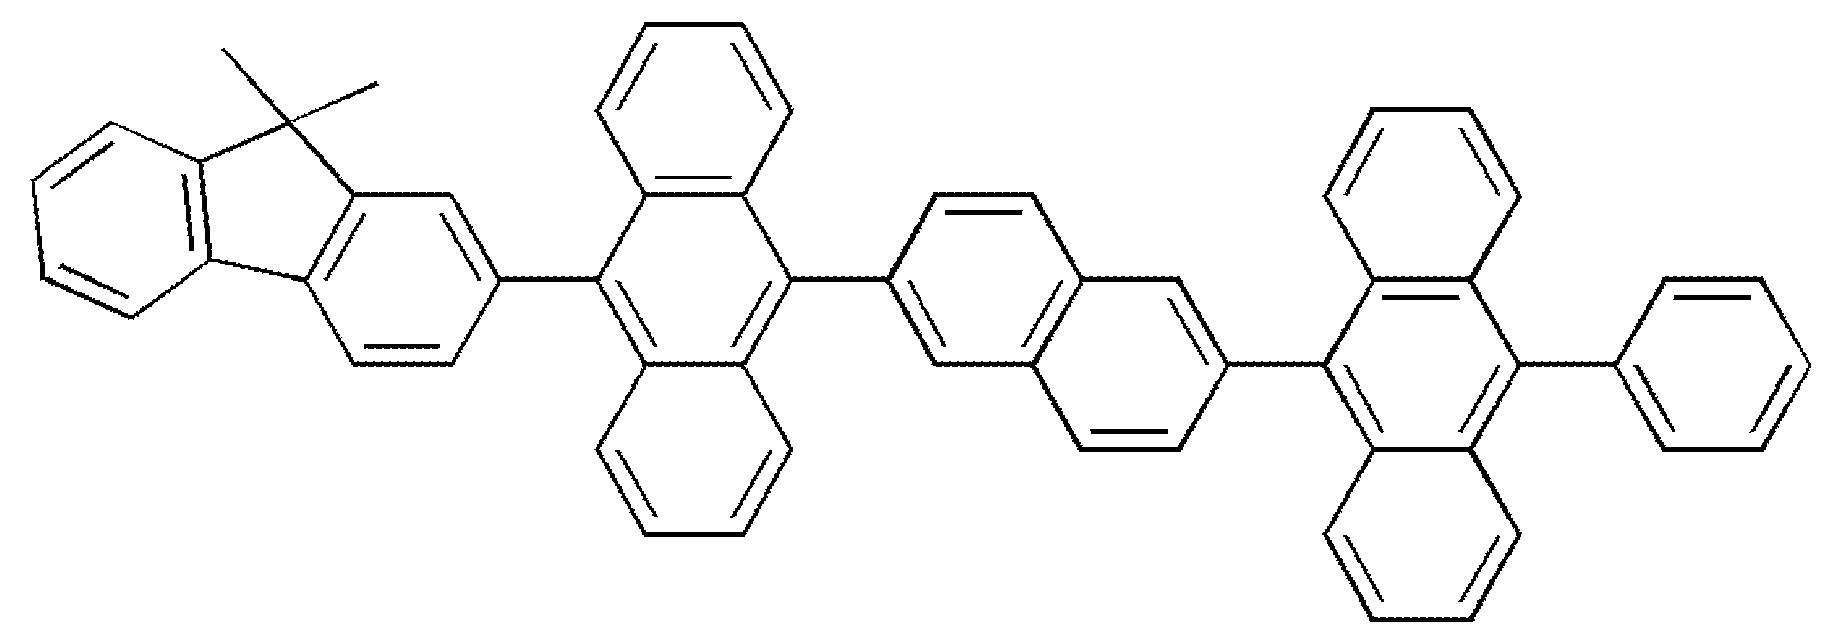 Figure 112007087103673-pat00664